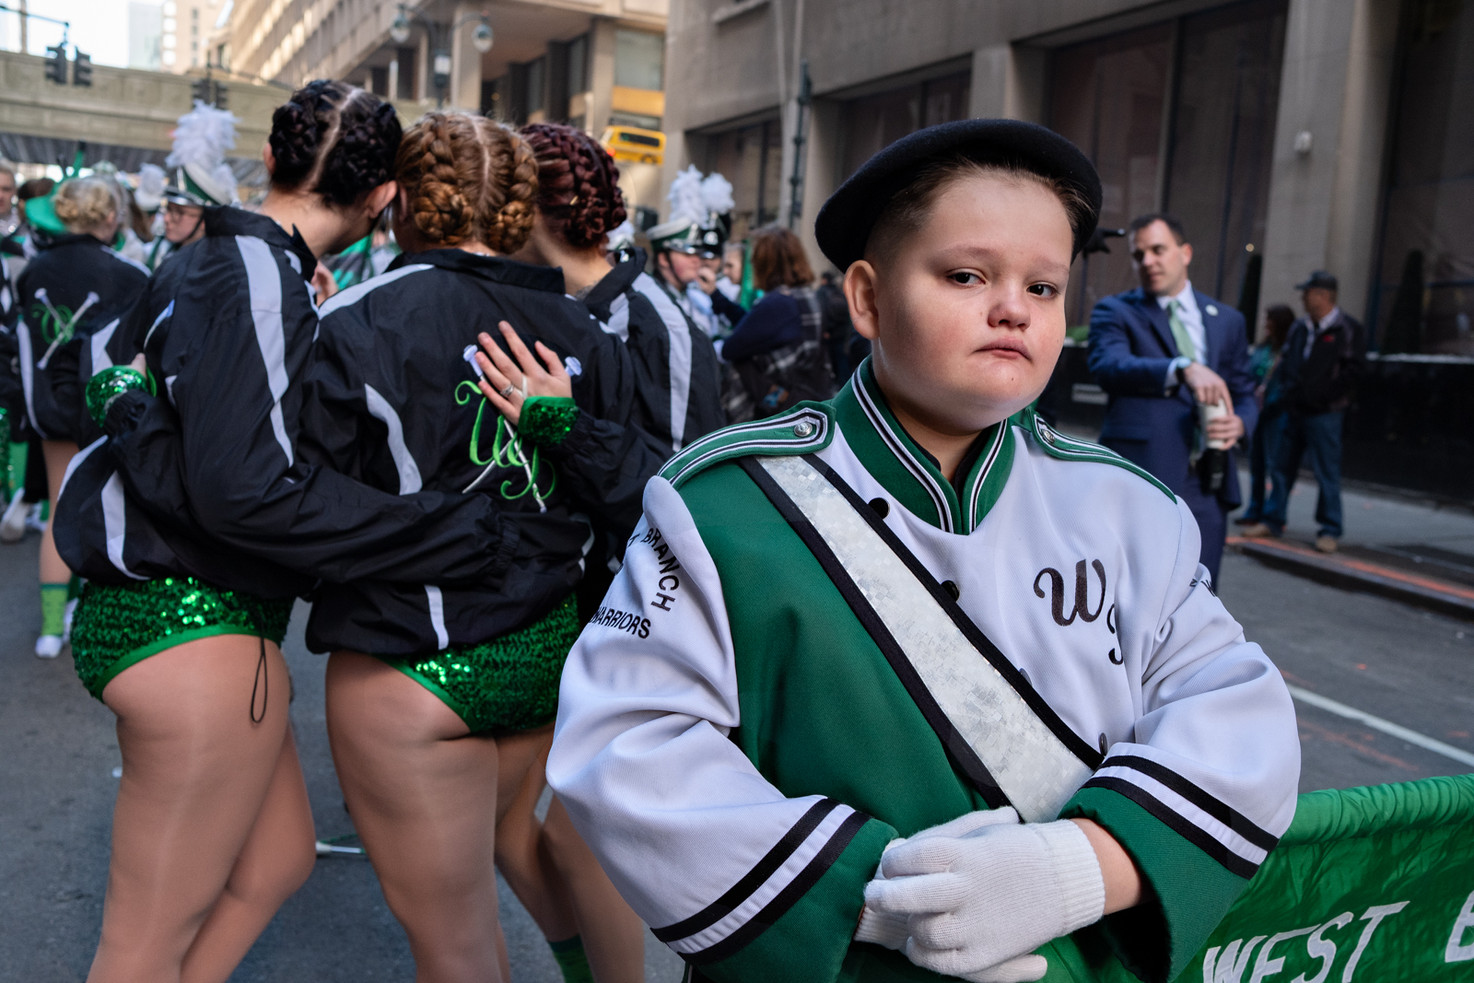 NYC_10_St. Pat_s Marchers.jpg